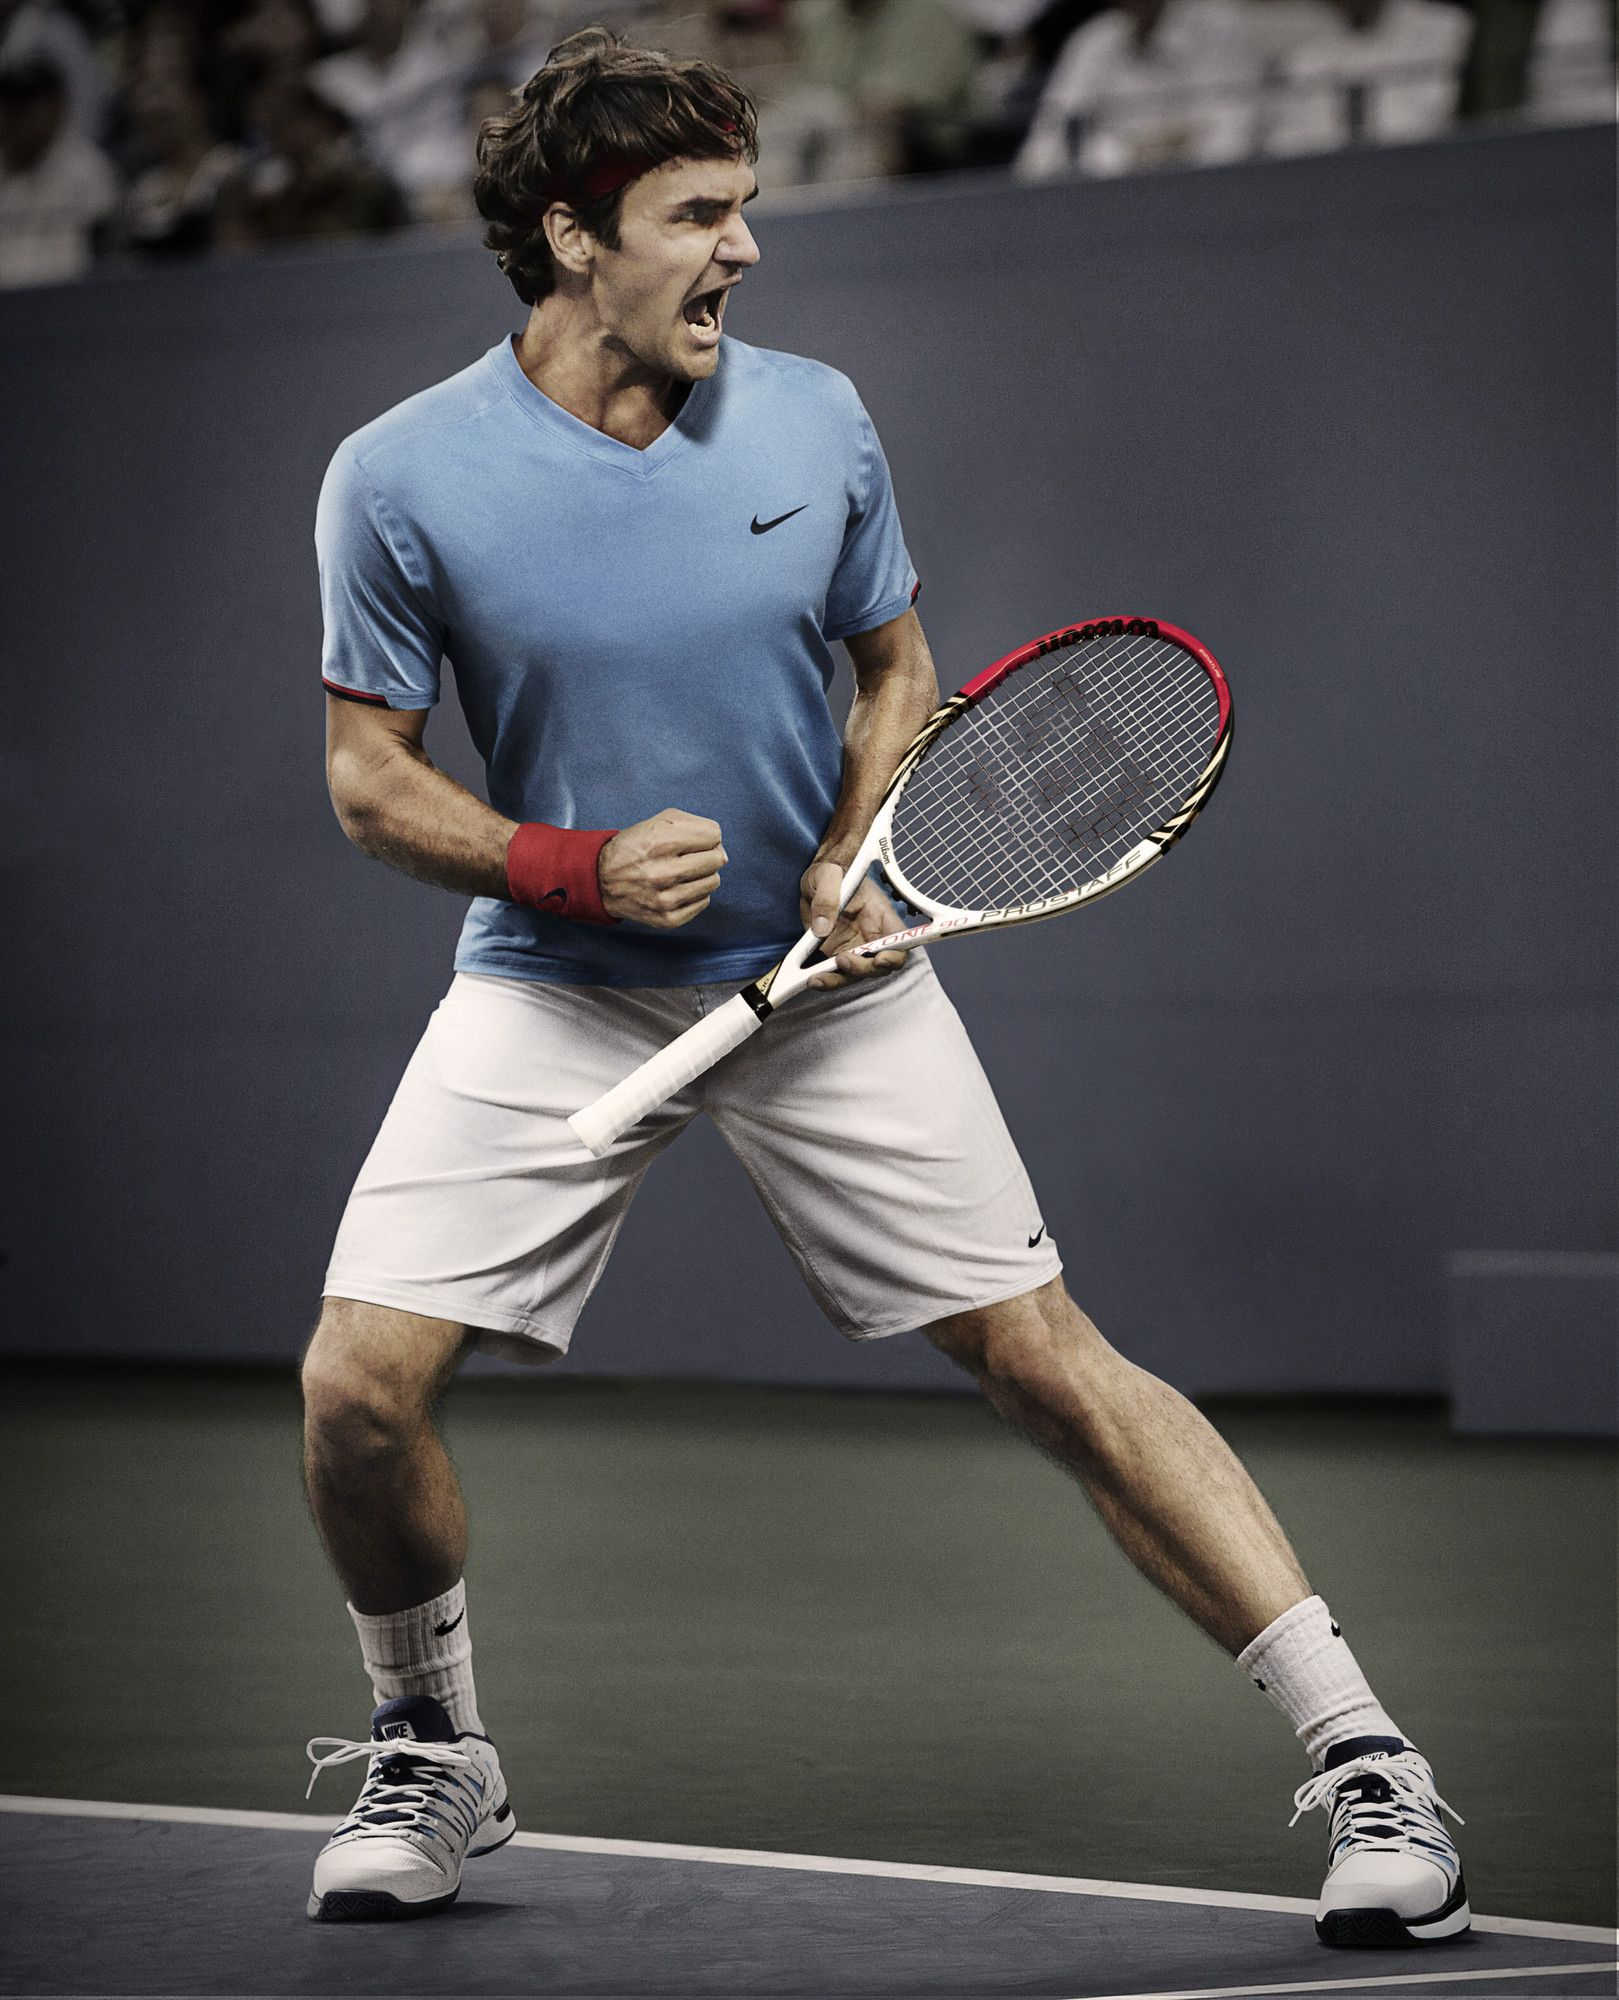 Federer 2012 Us Open Nike Outfit Roger Federer Tennis Nike Tennis